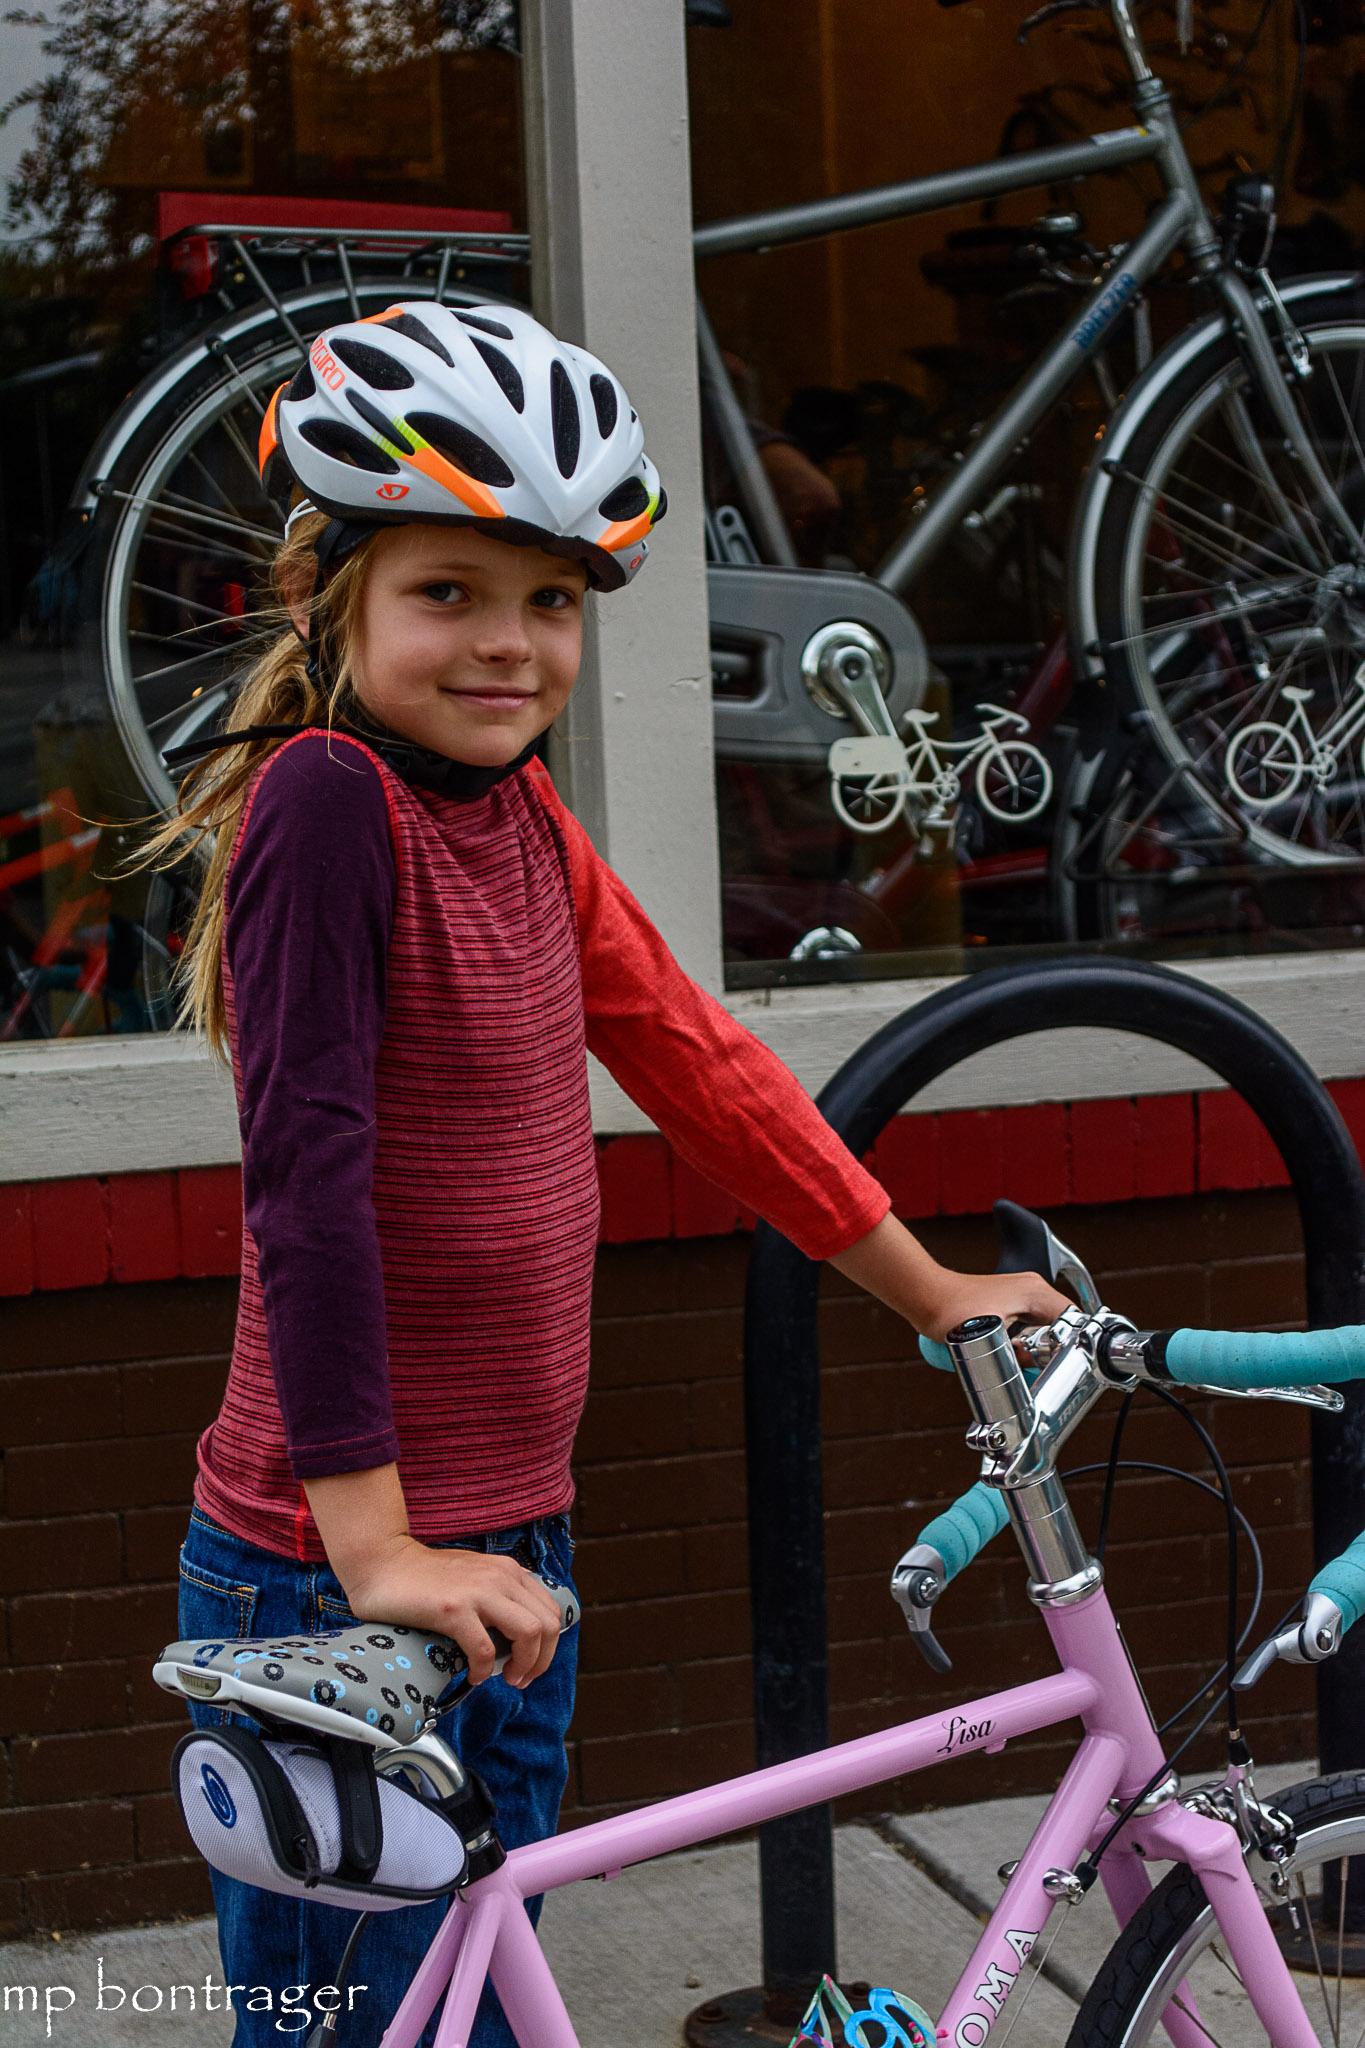 new bike day!